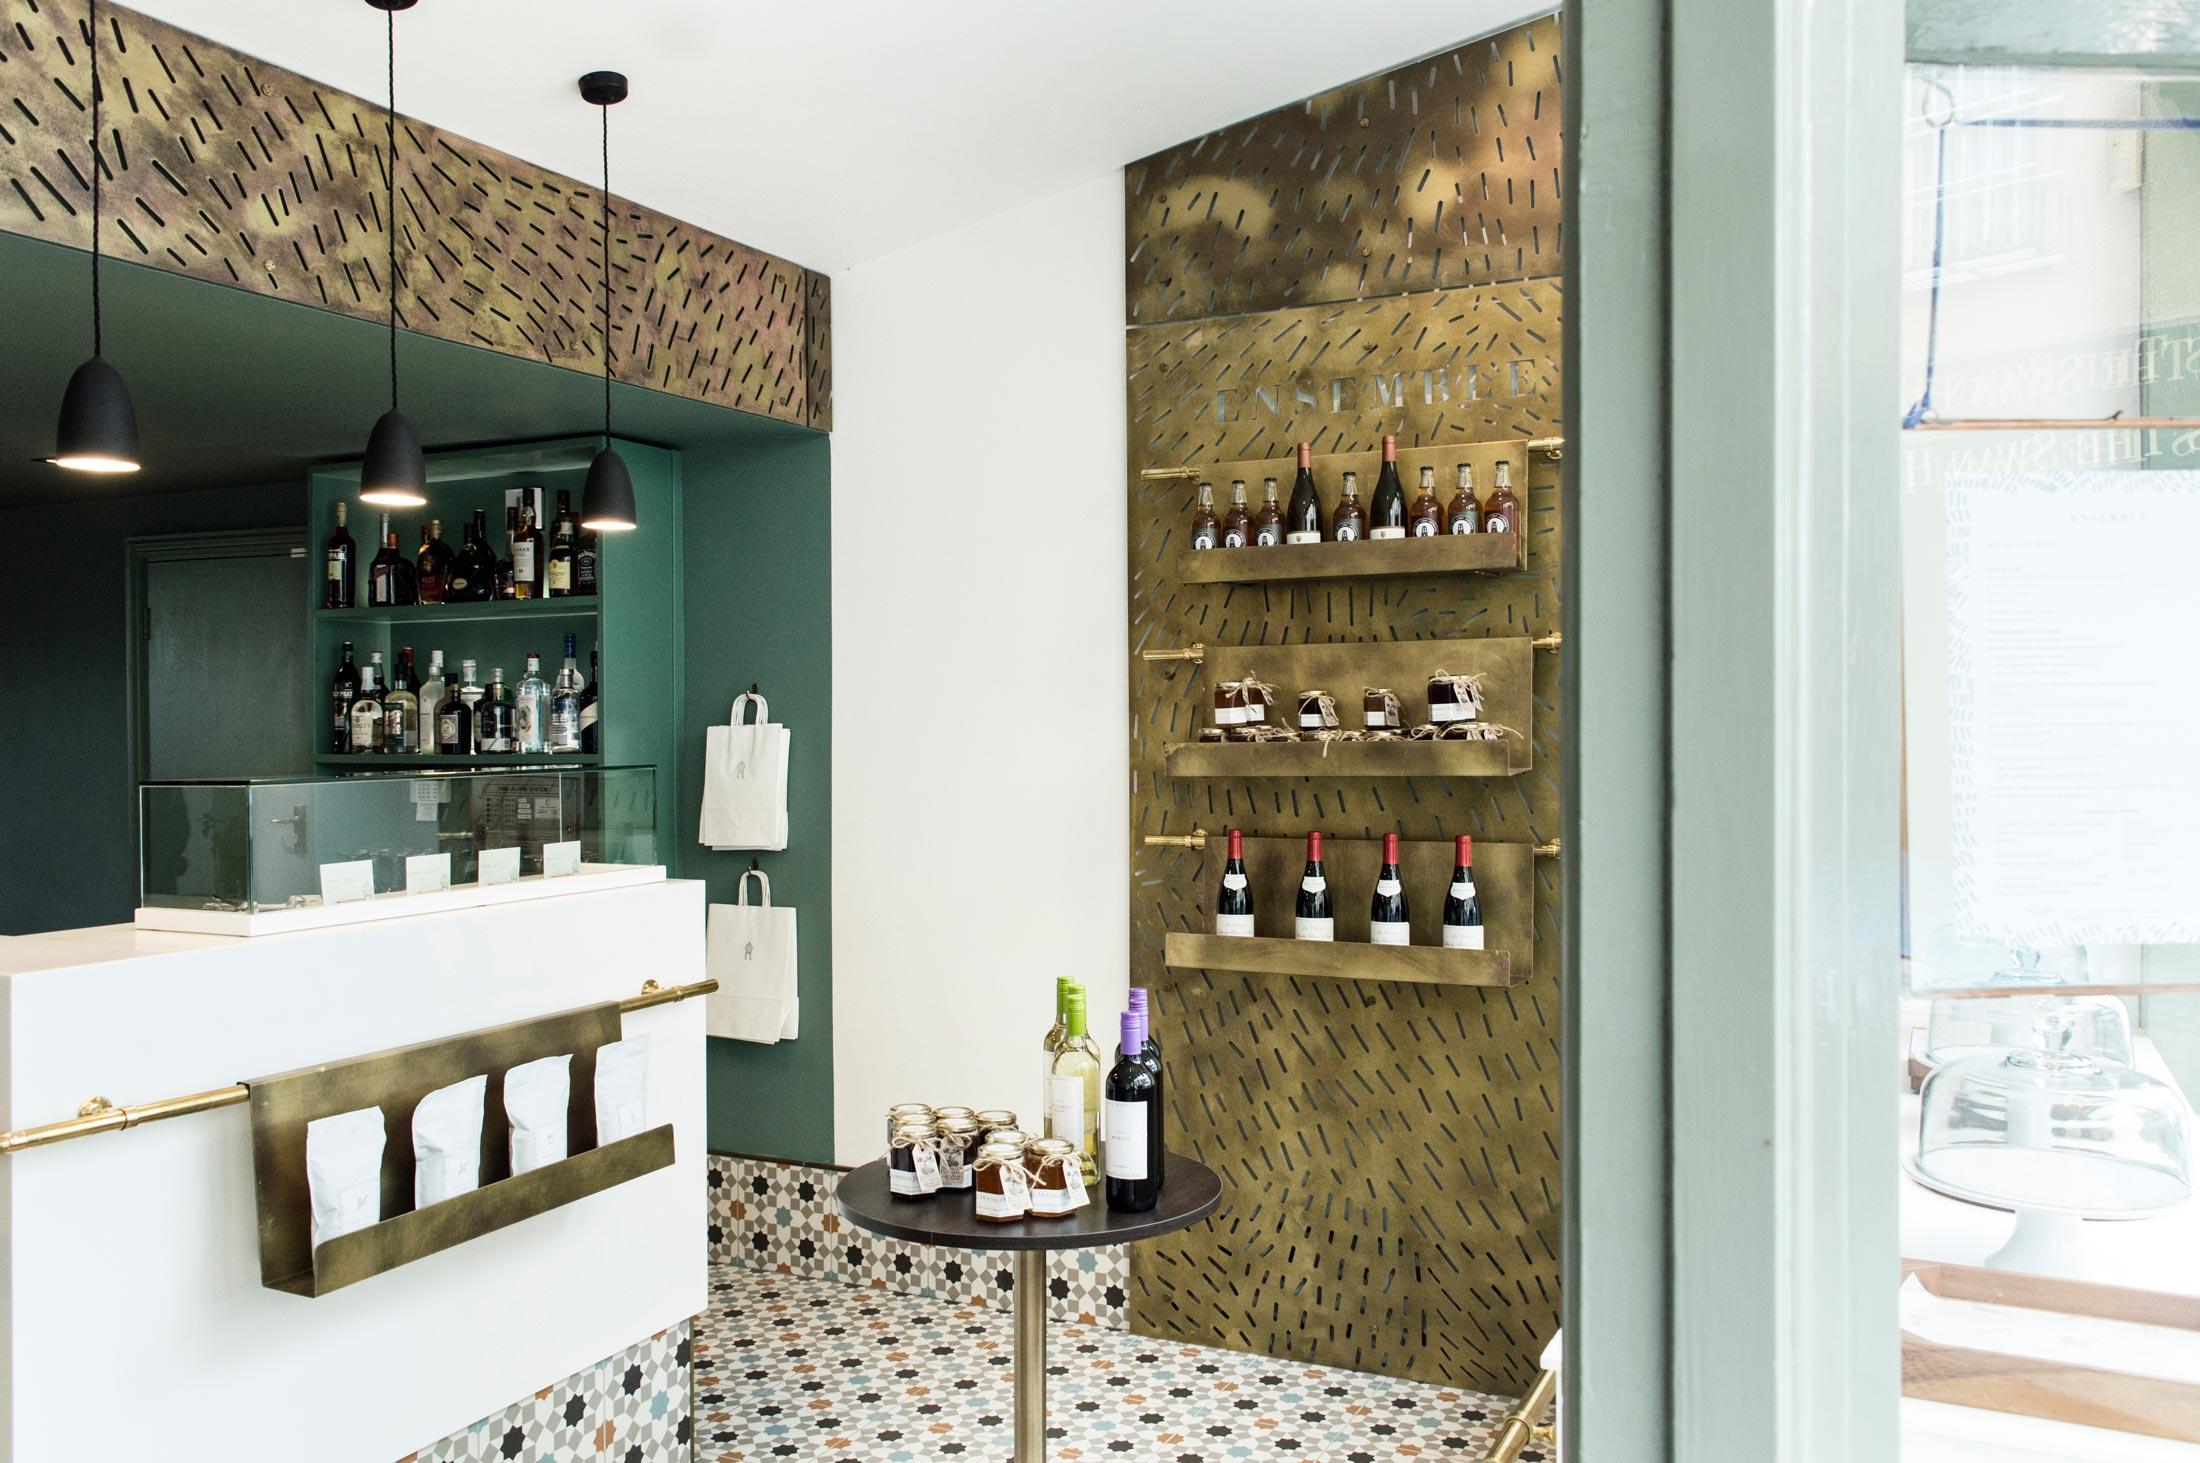 Ensemble Wells Restaurant Retail Overview